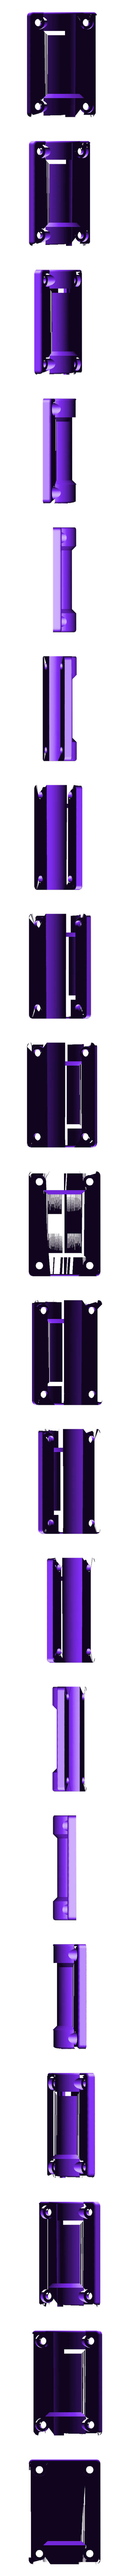 clamp-cover.stl Download free STL file Heat Set Insert Press • 3D printer object, Adafruit